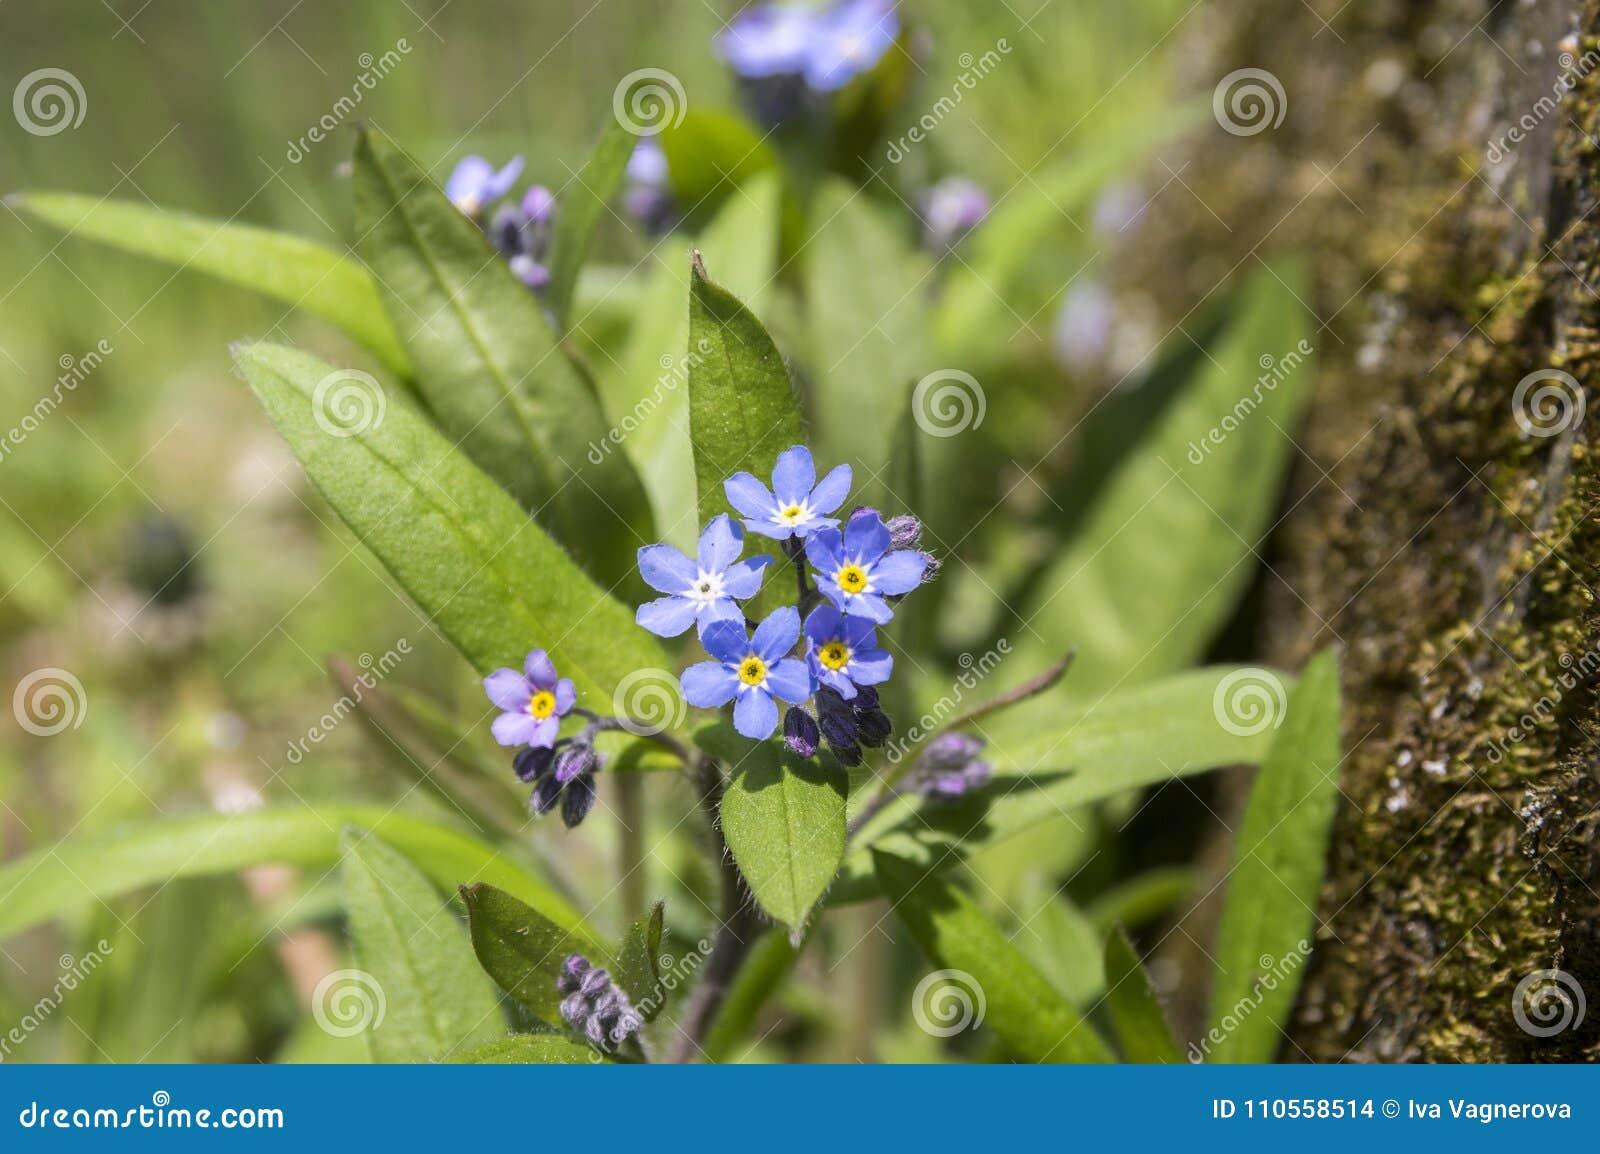 Myosotis Sylvatica In Bloom Stock Photo Image Of Herbaceous